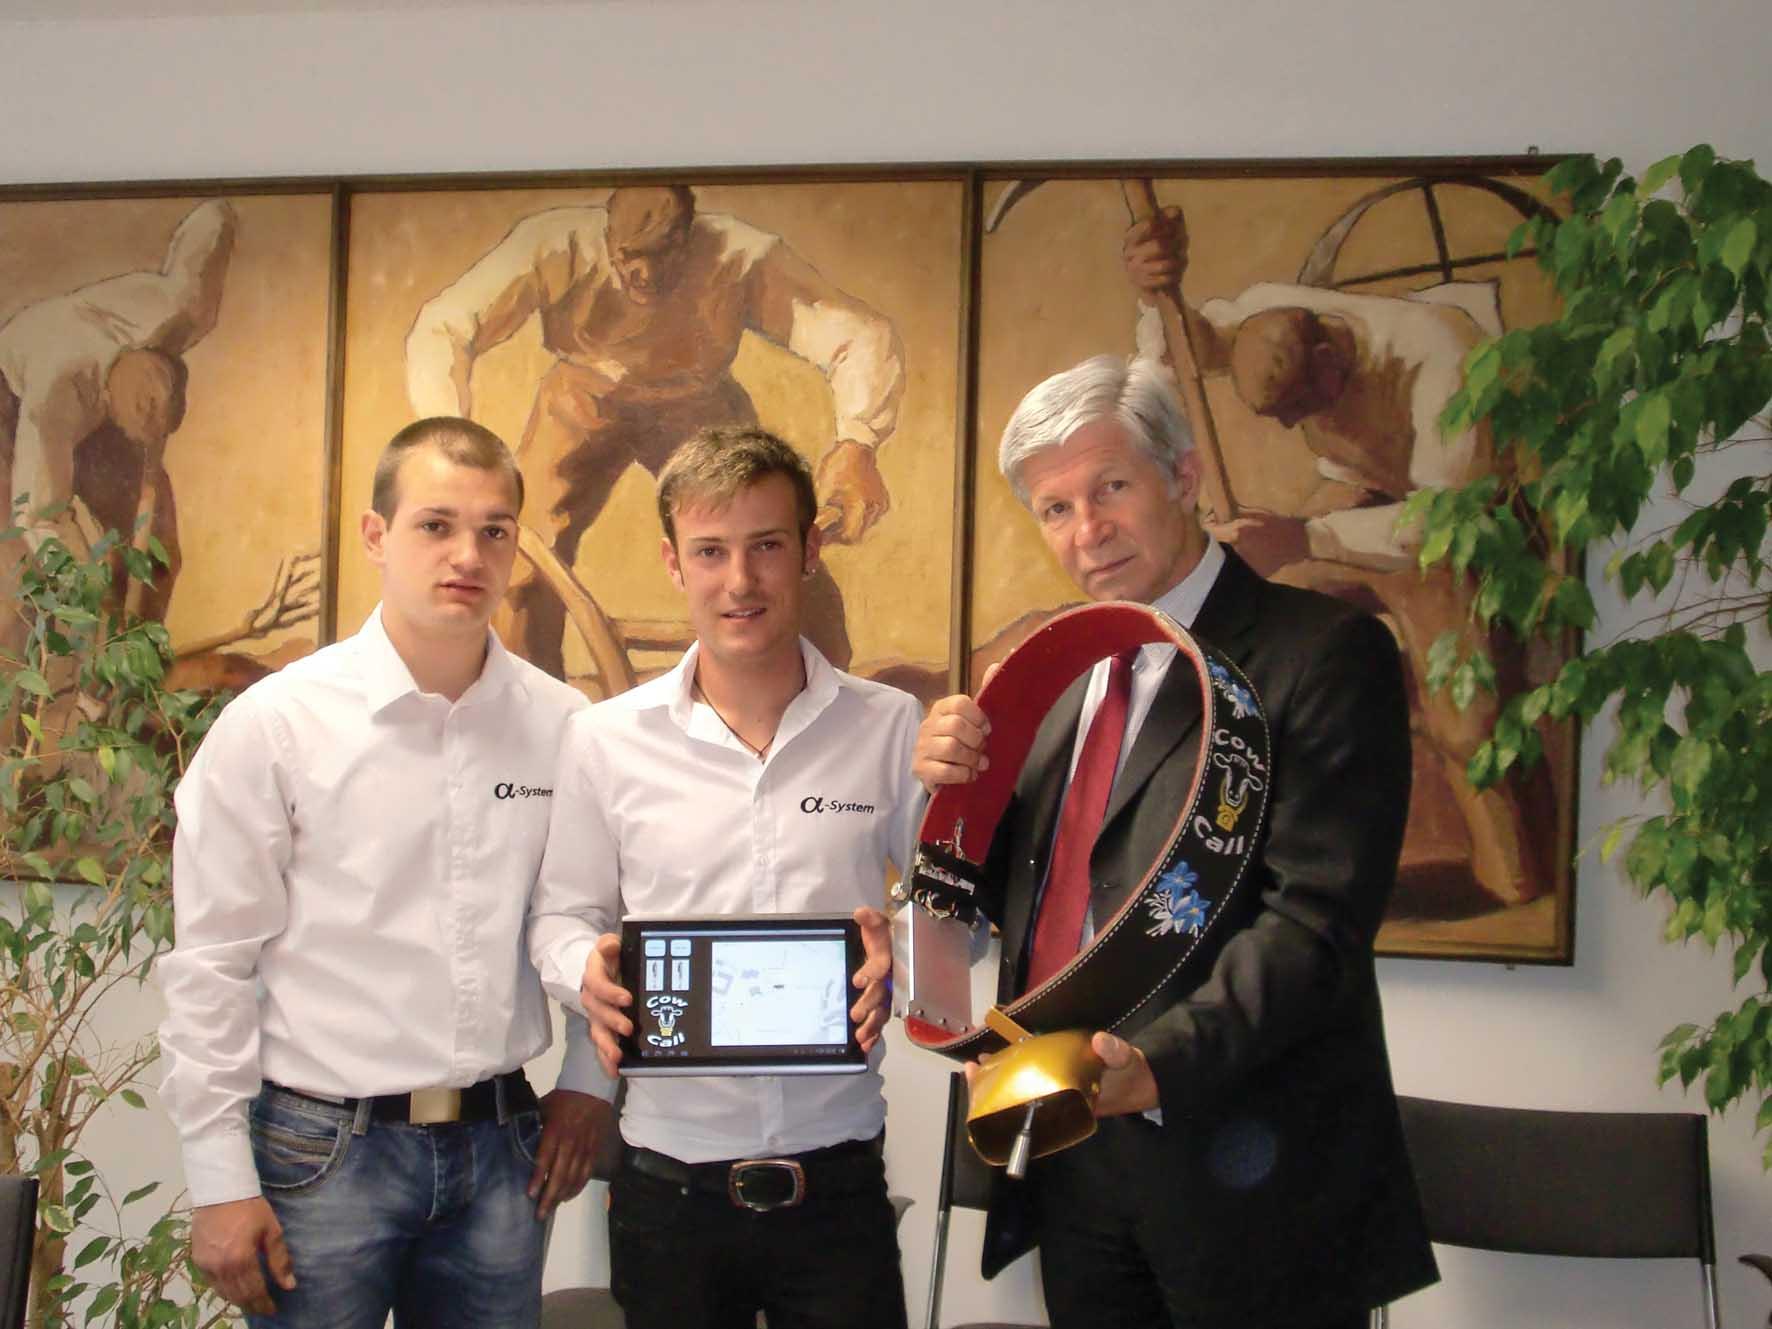 pab campanaccio high-tech Martin Monsorno Patrick Anderlan e Hans Berger 1